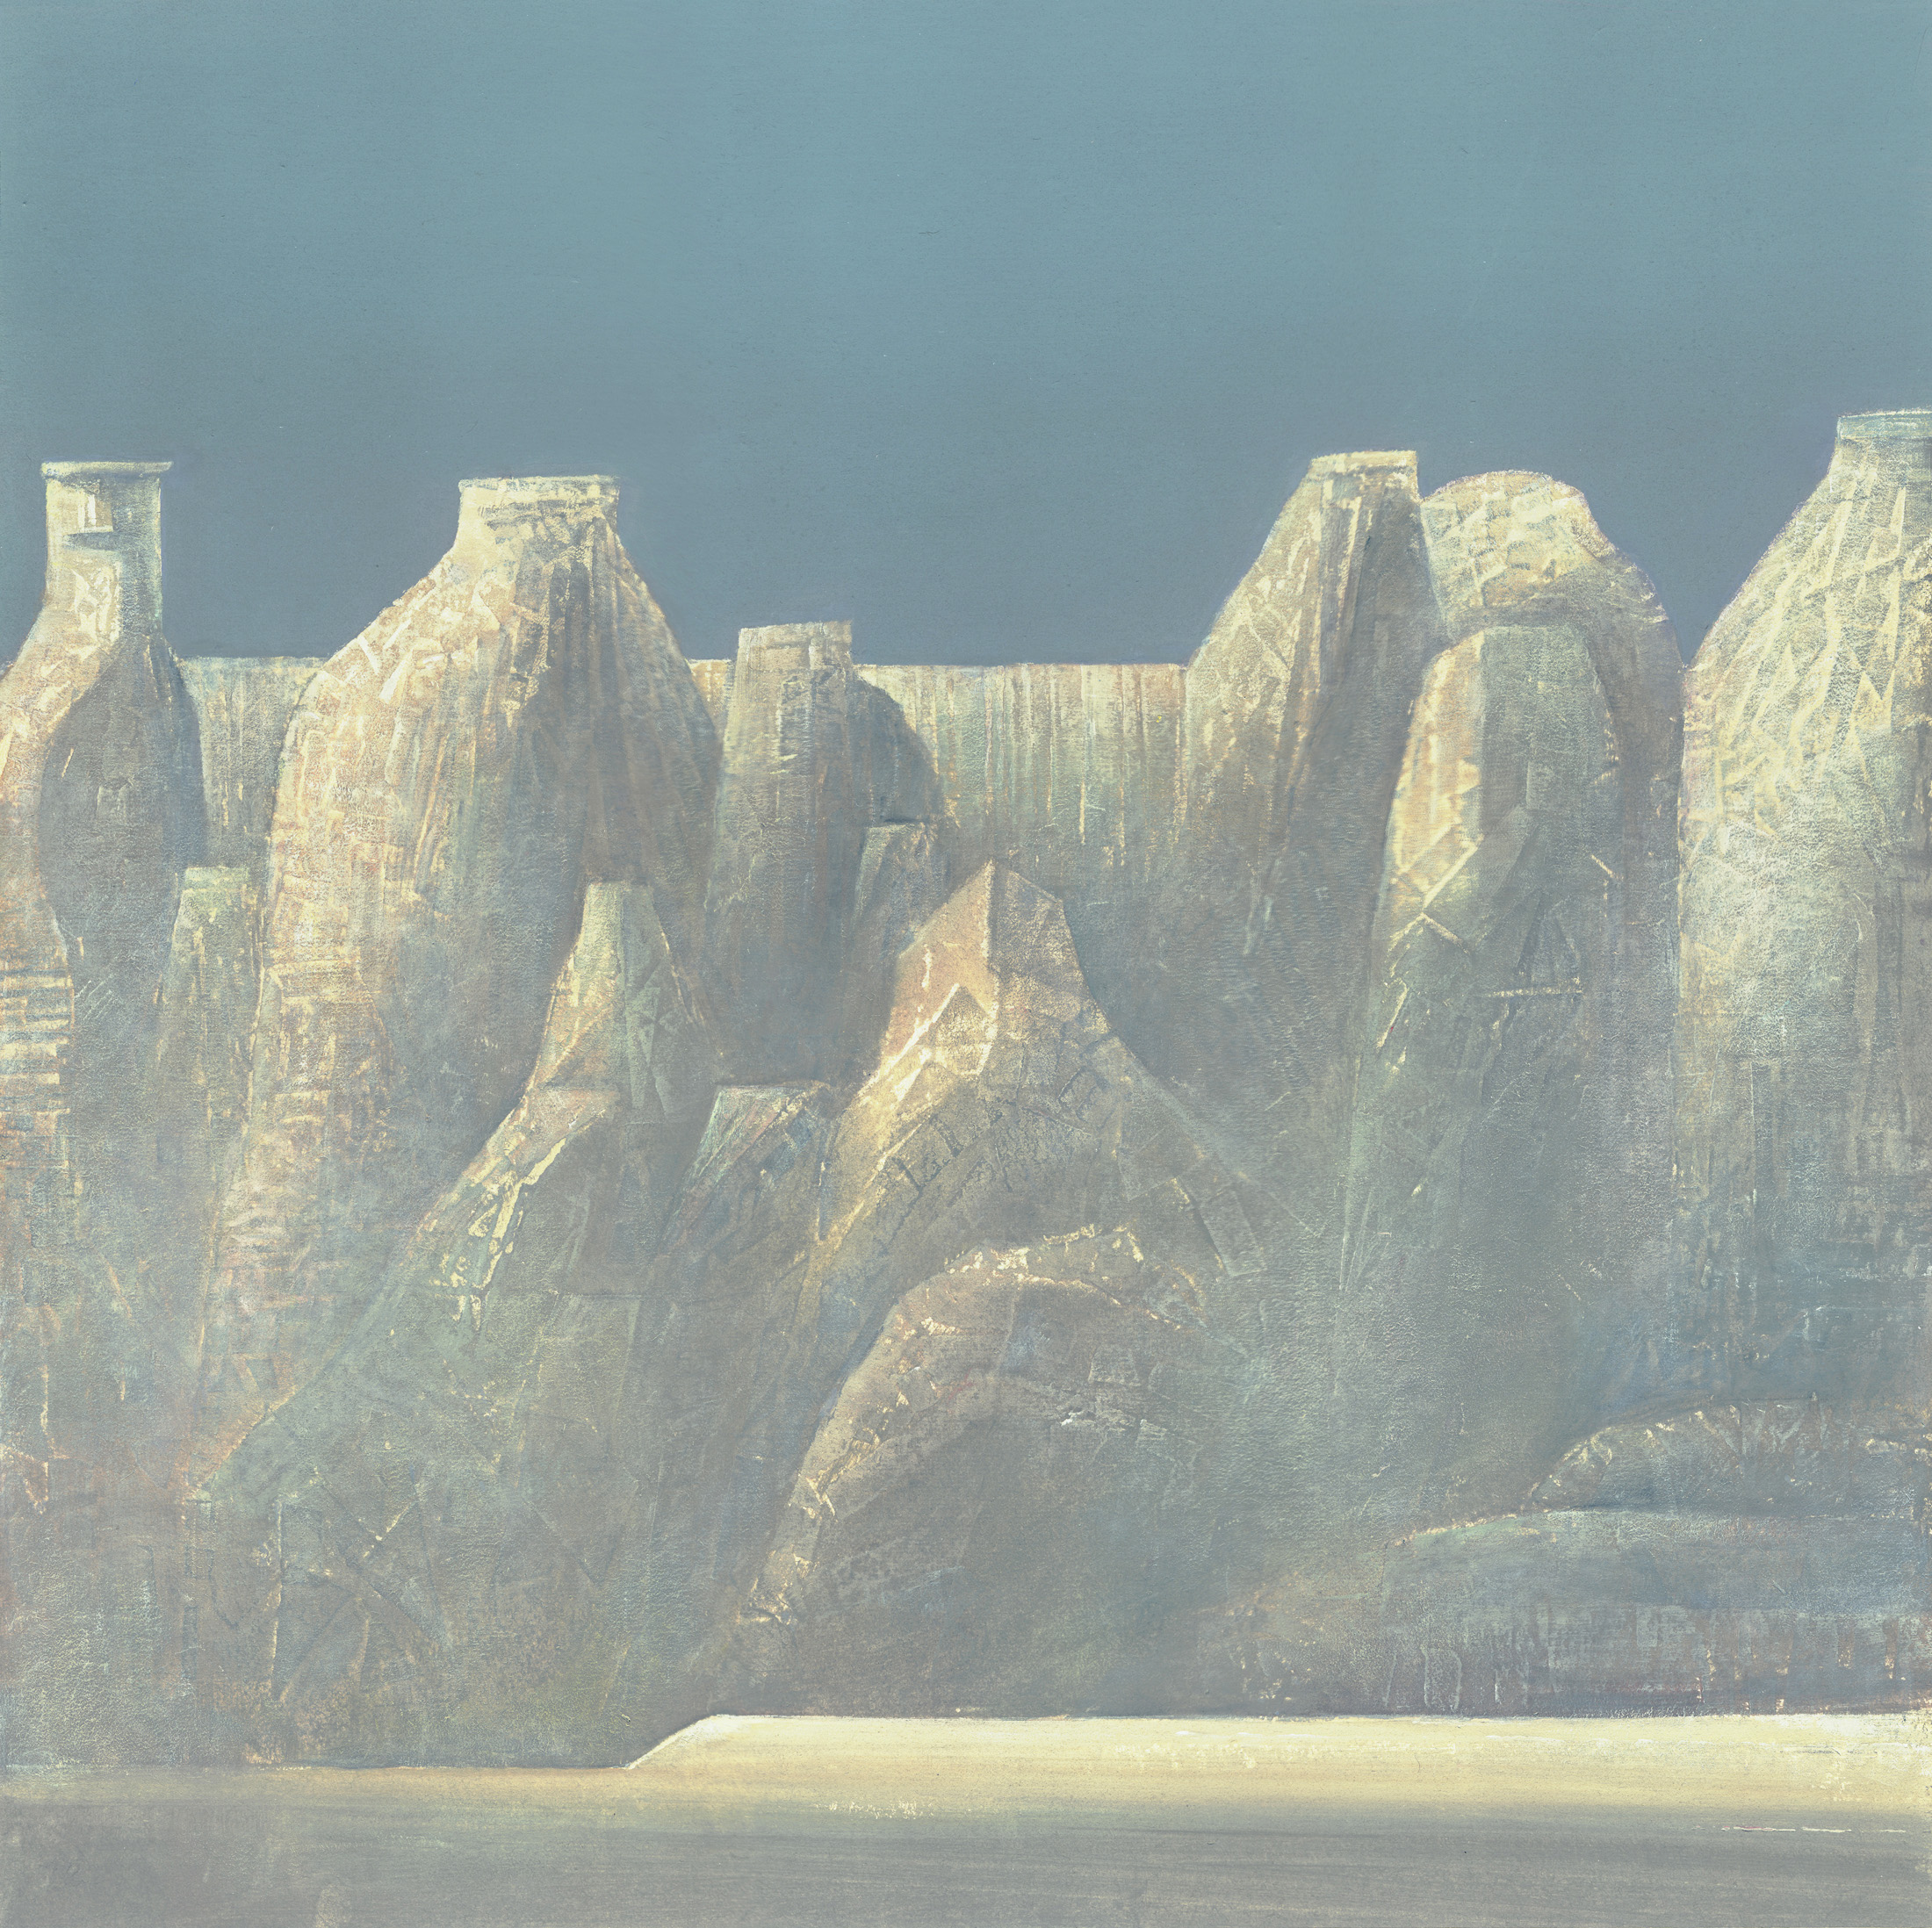 Trulli Canyon